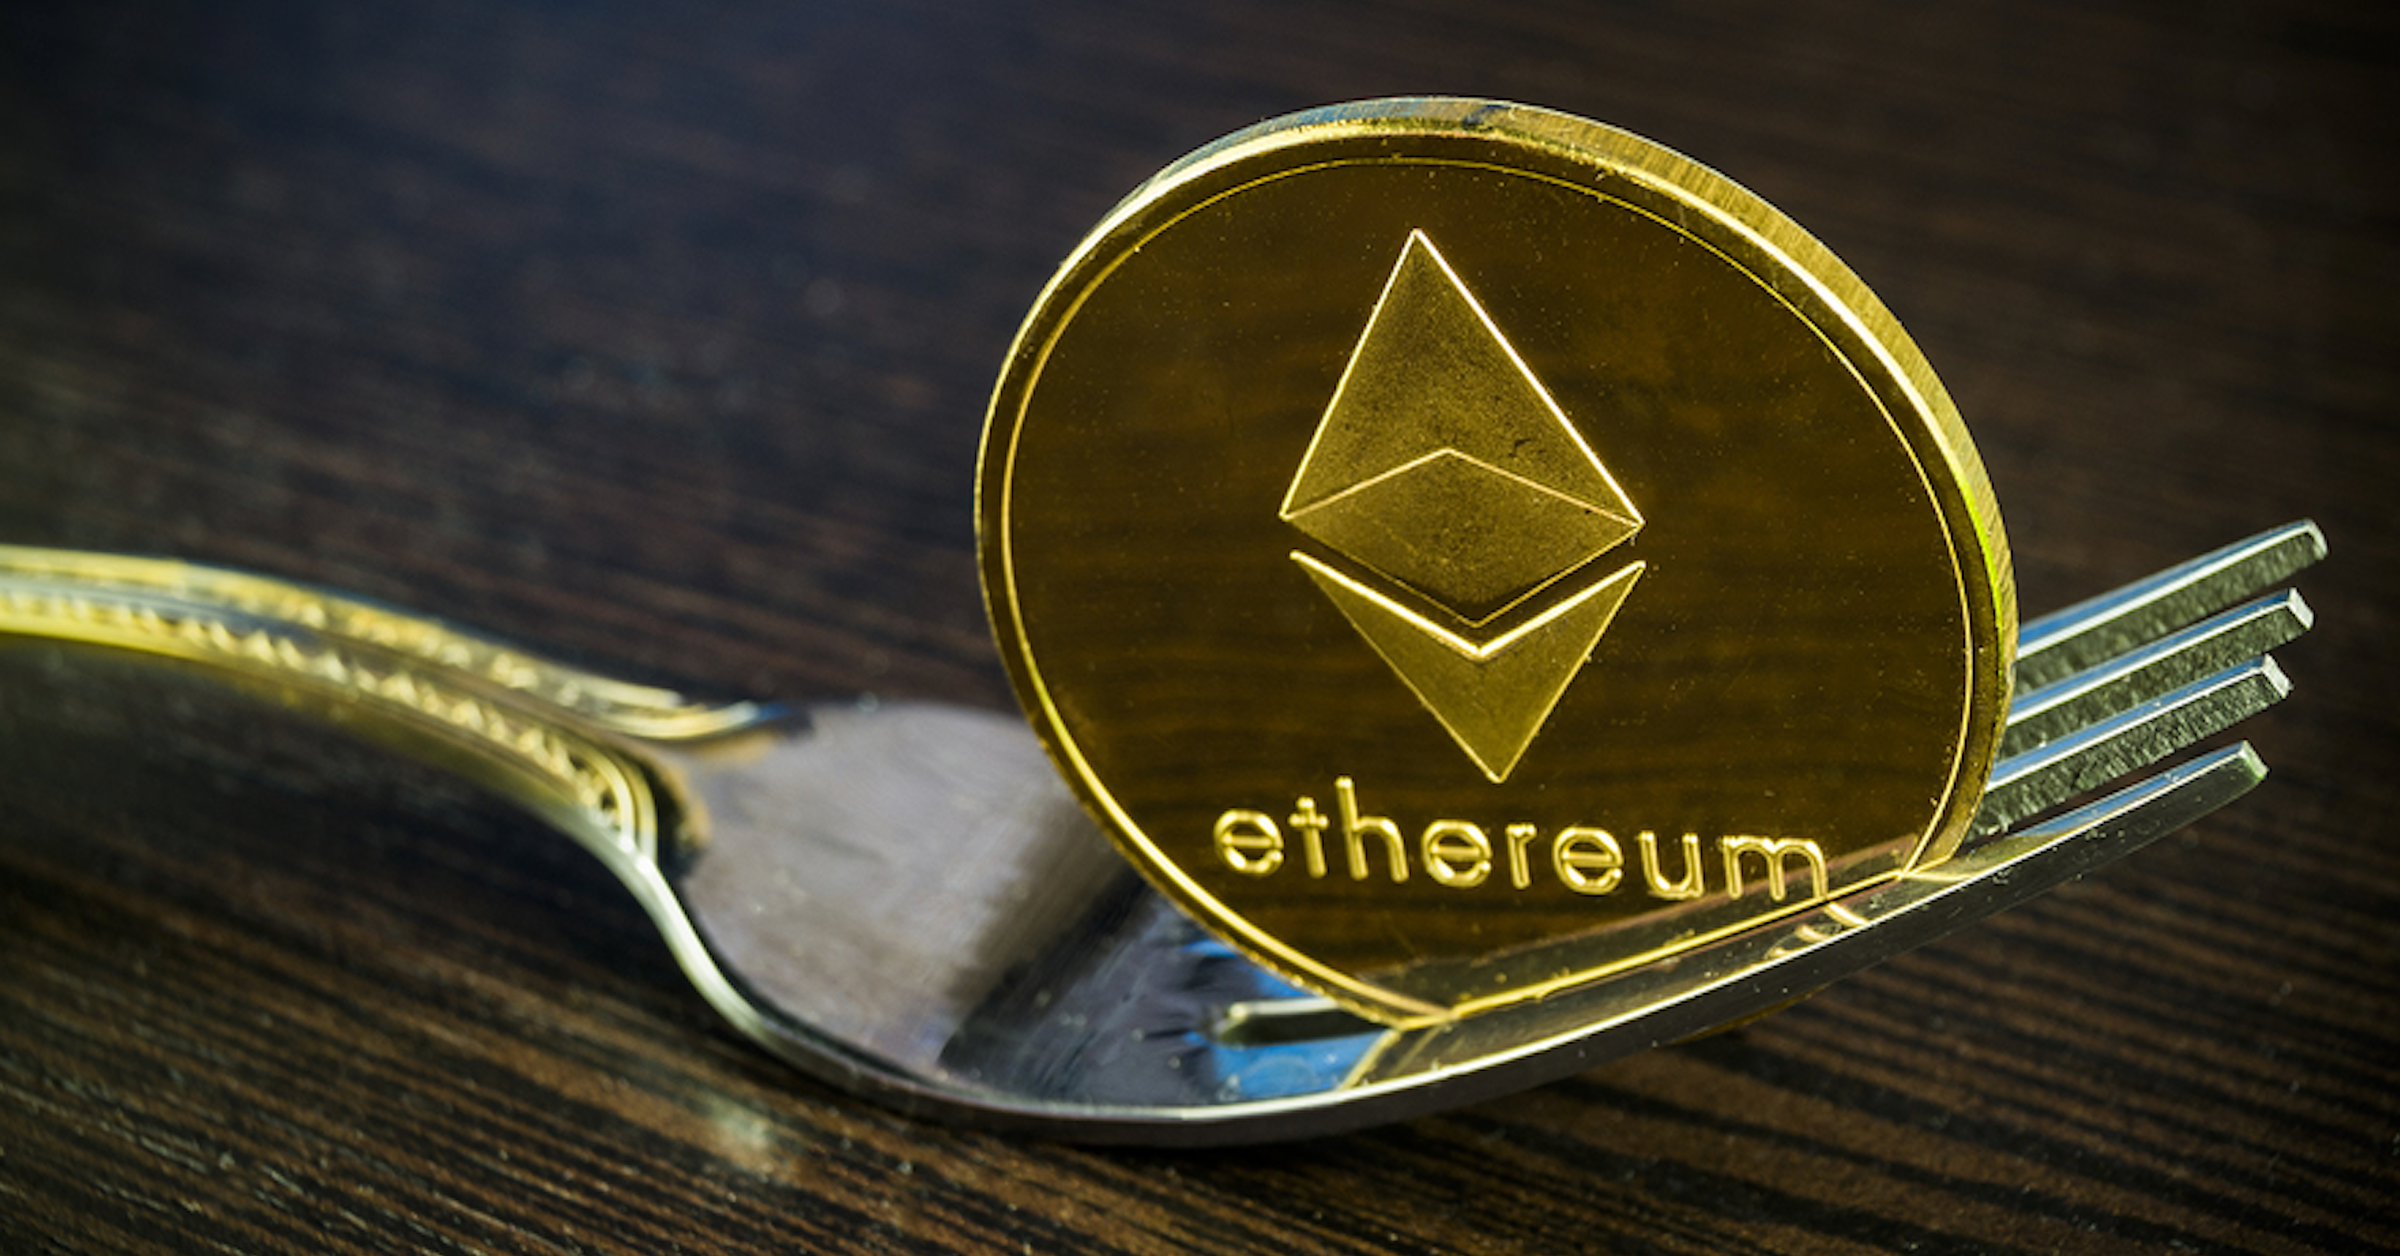 ethereum-constantinople-hard-fork-cryptocurrency-bitcoin-blockchain-ether-eth_jpg.